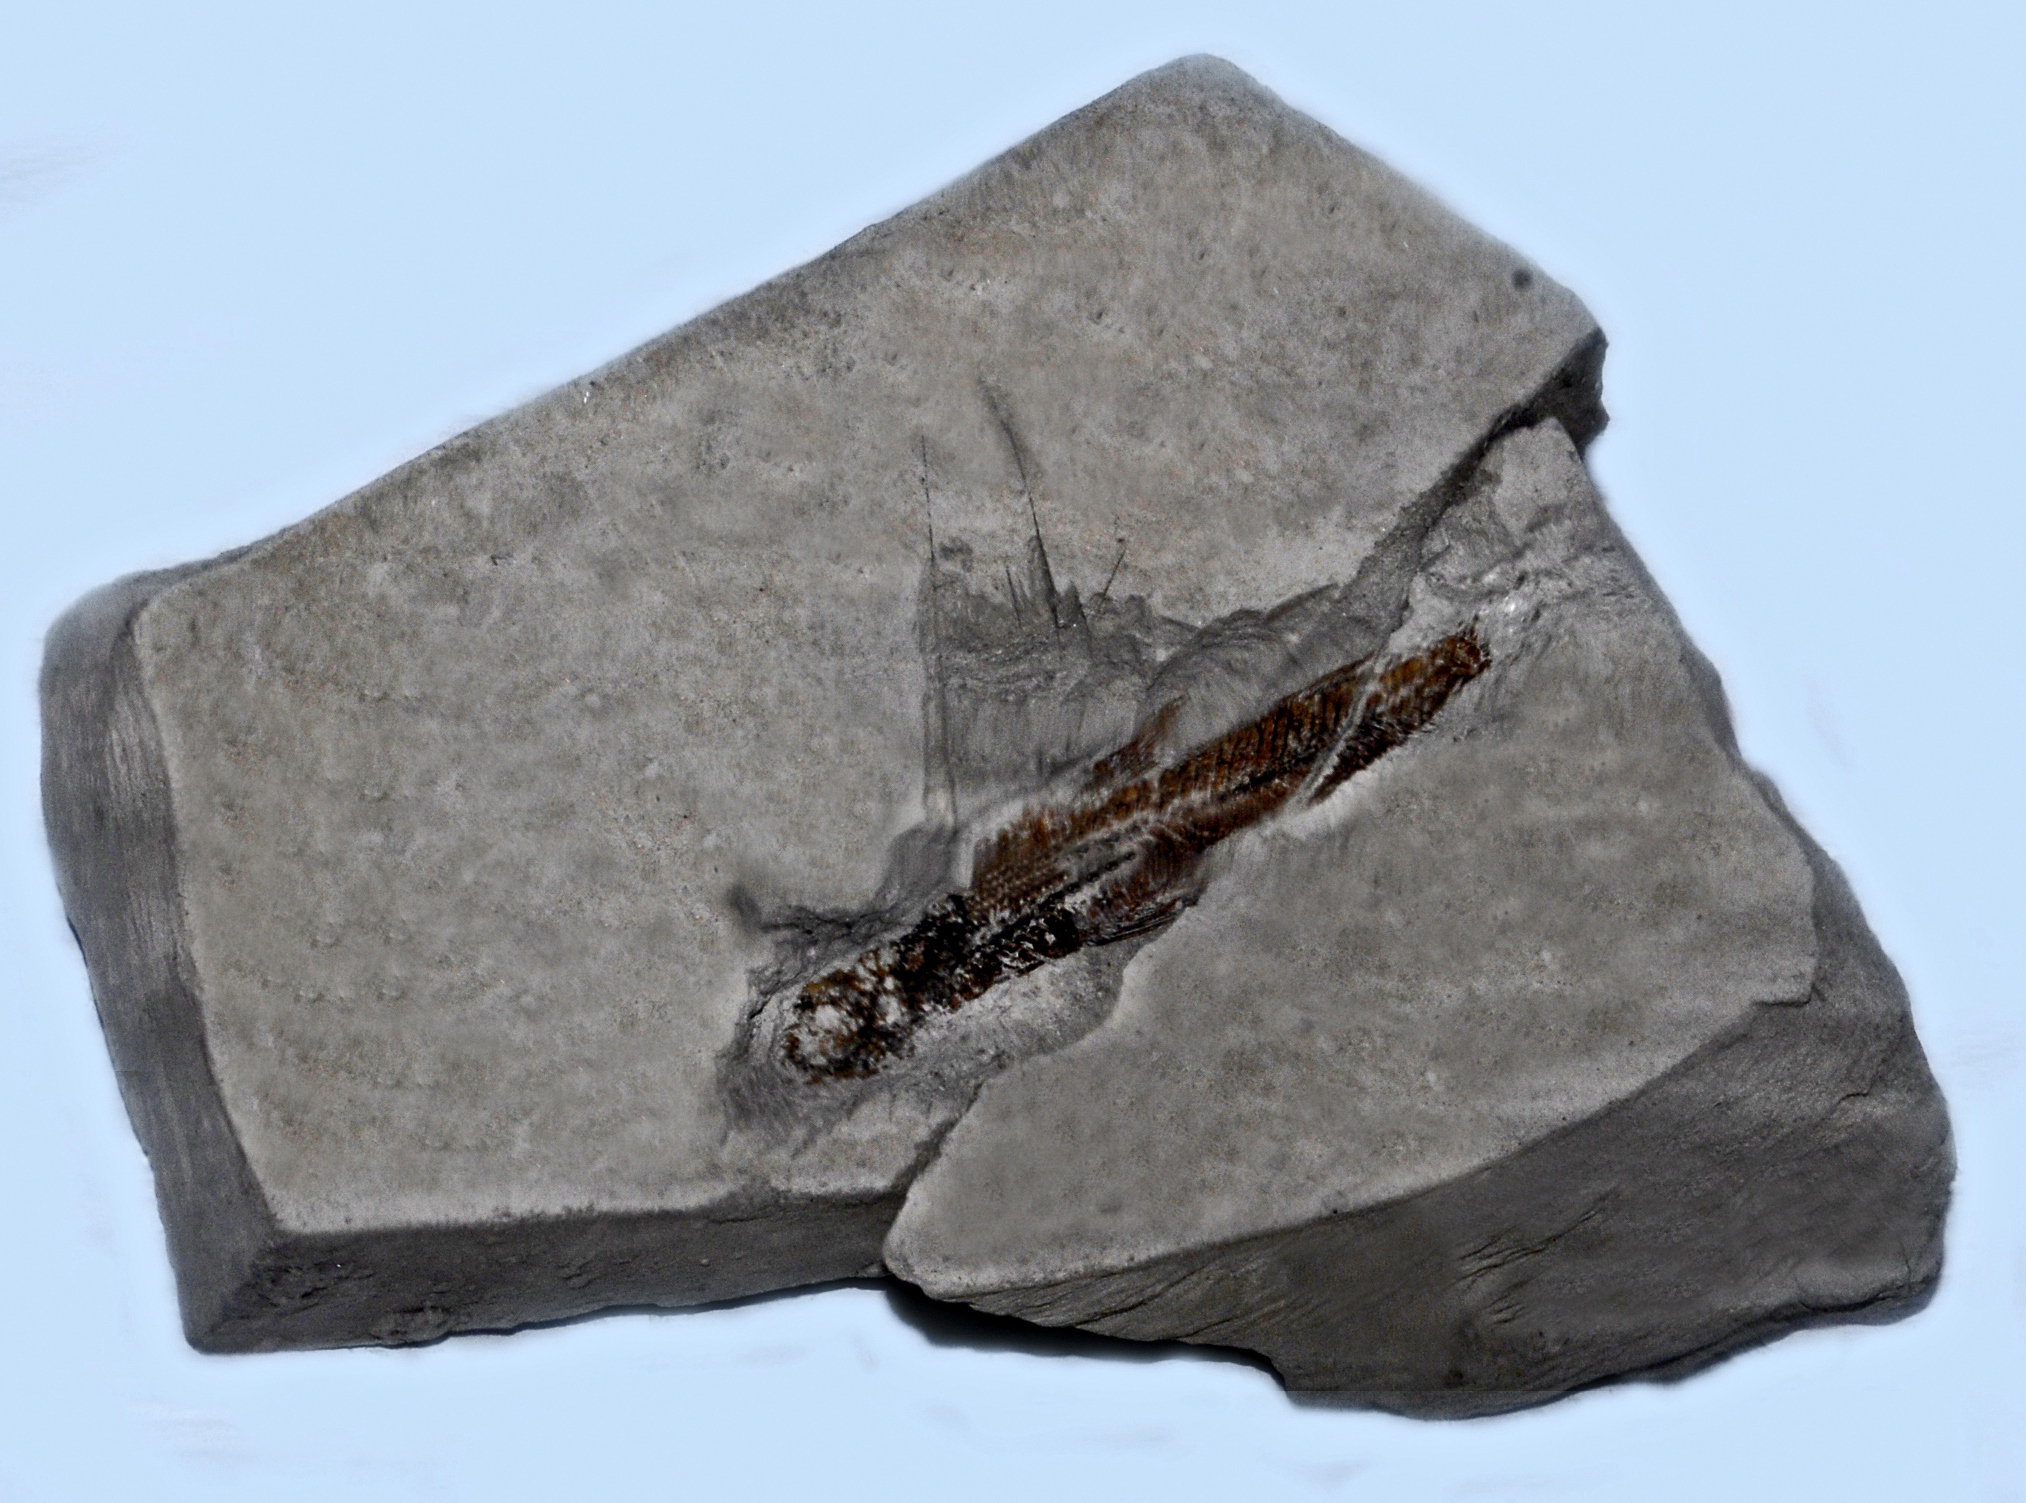 Image of codlet